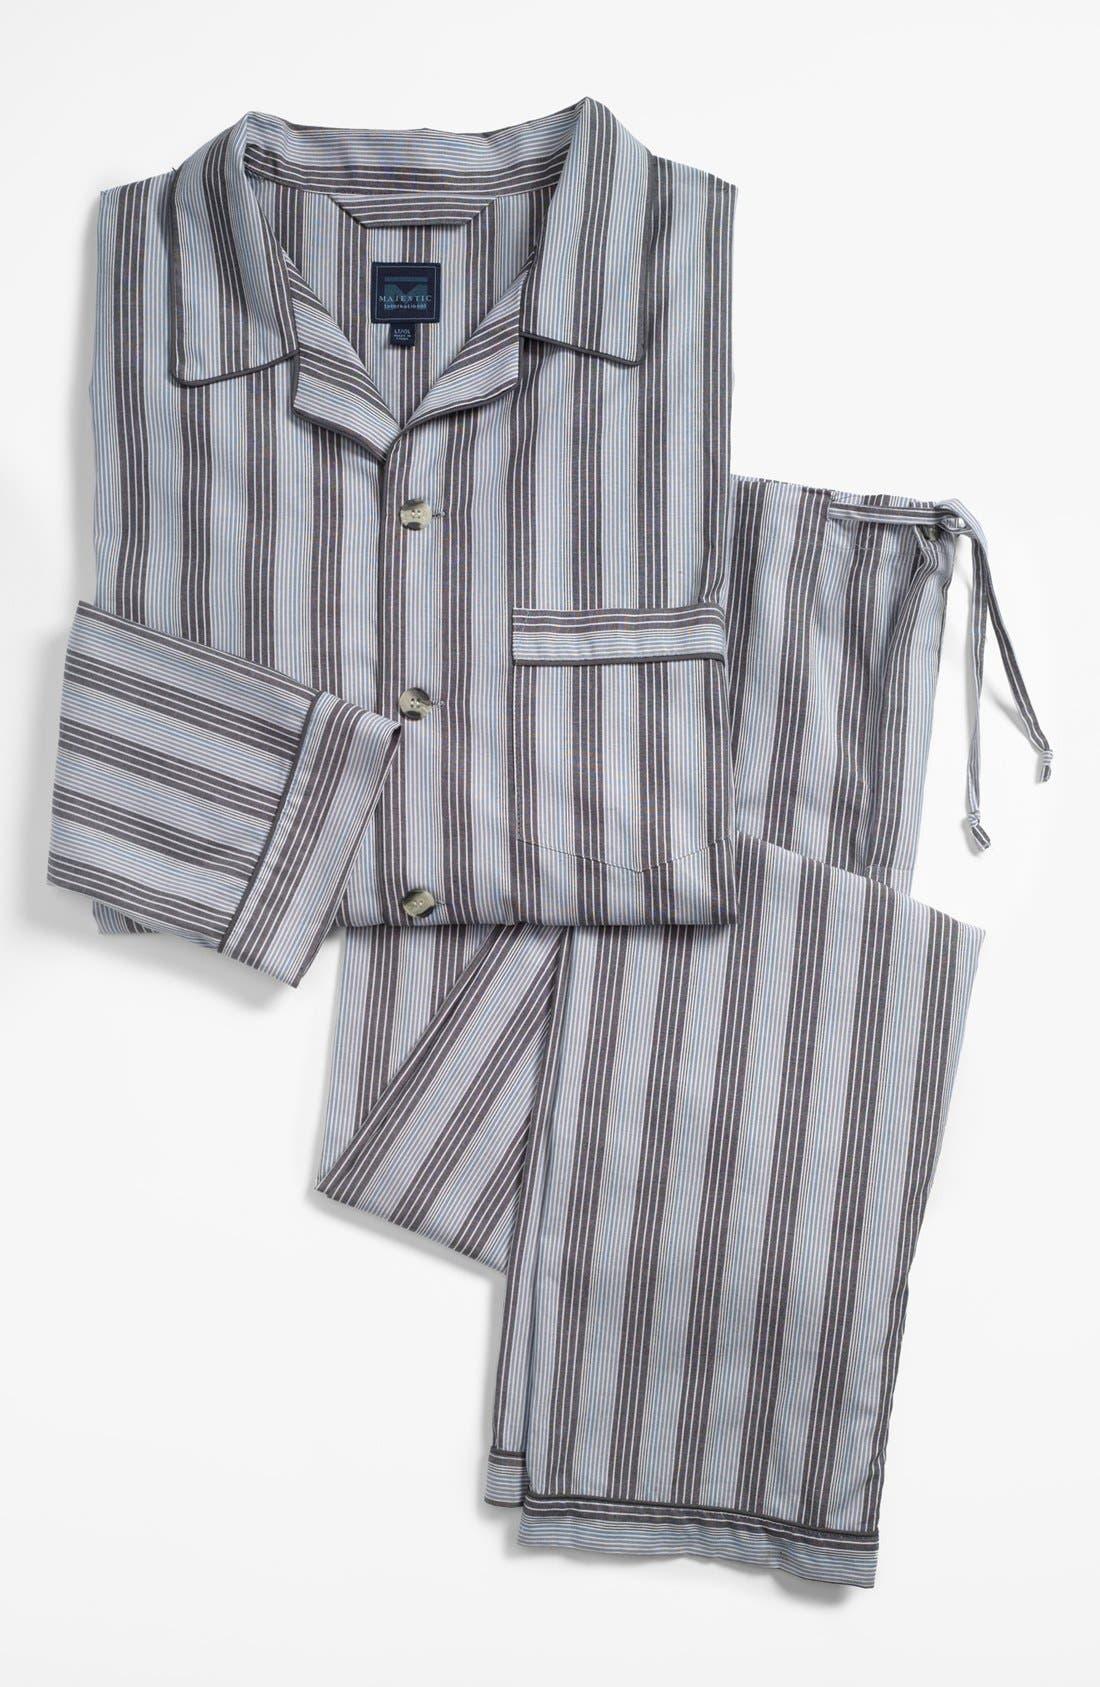 Alternate Image 1 Selected - Majestic International 'Westin' Pajamas (Big & Tall)